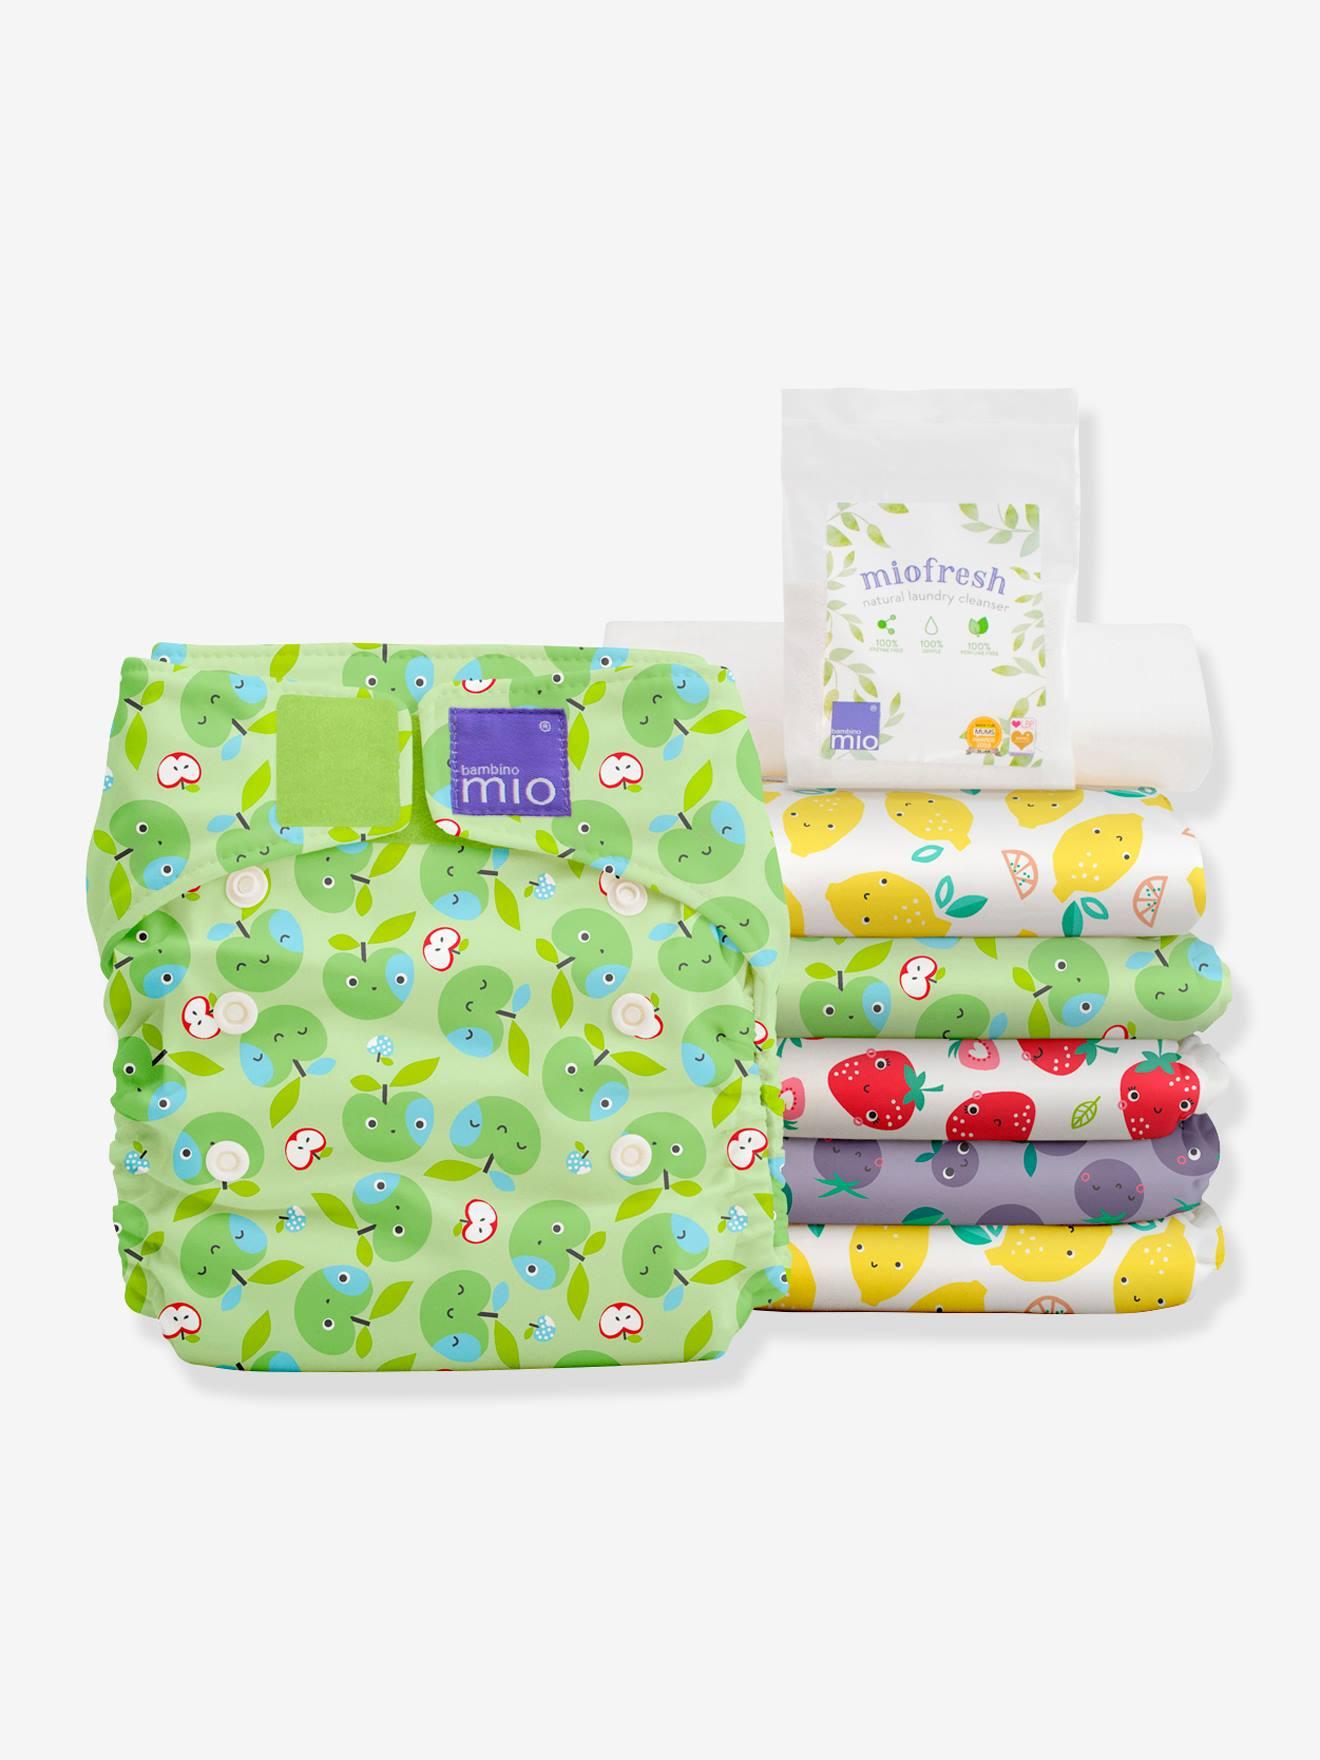 Miosolo pack de couches lavables BAMBINO MIO panier fruite